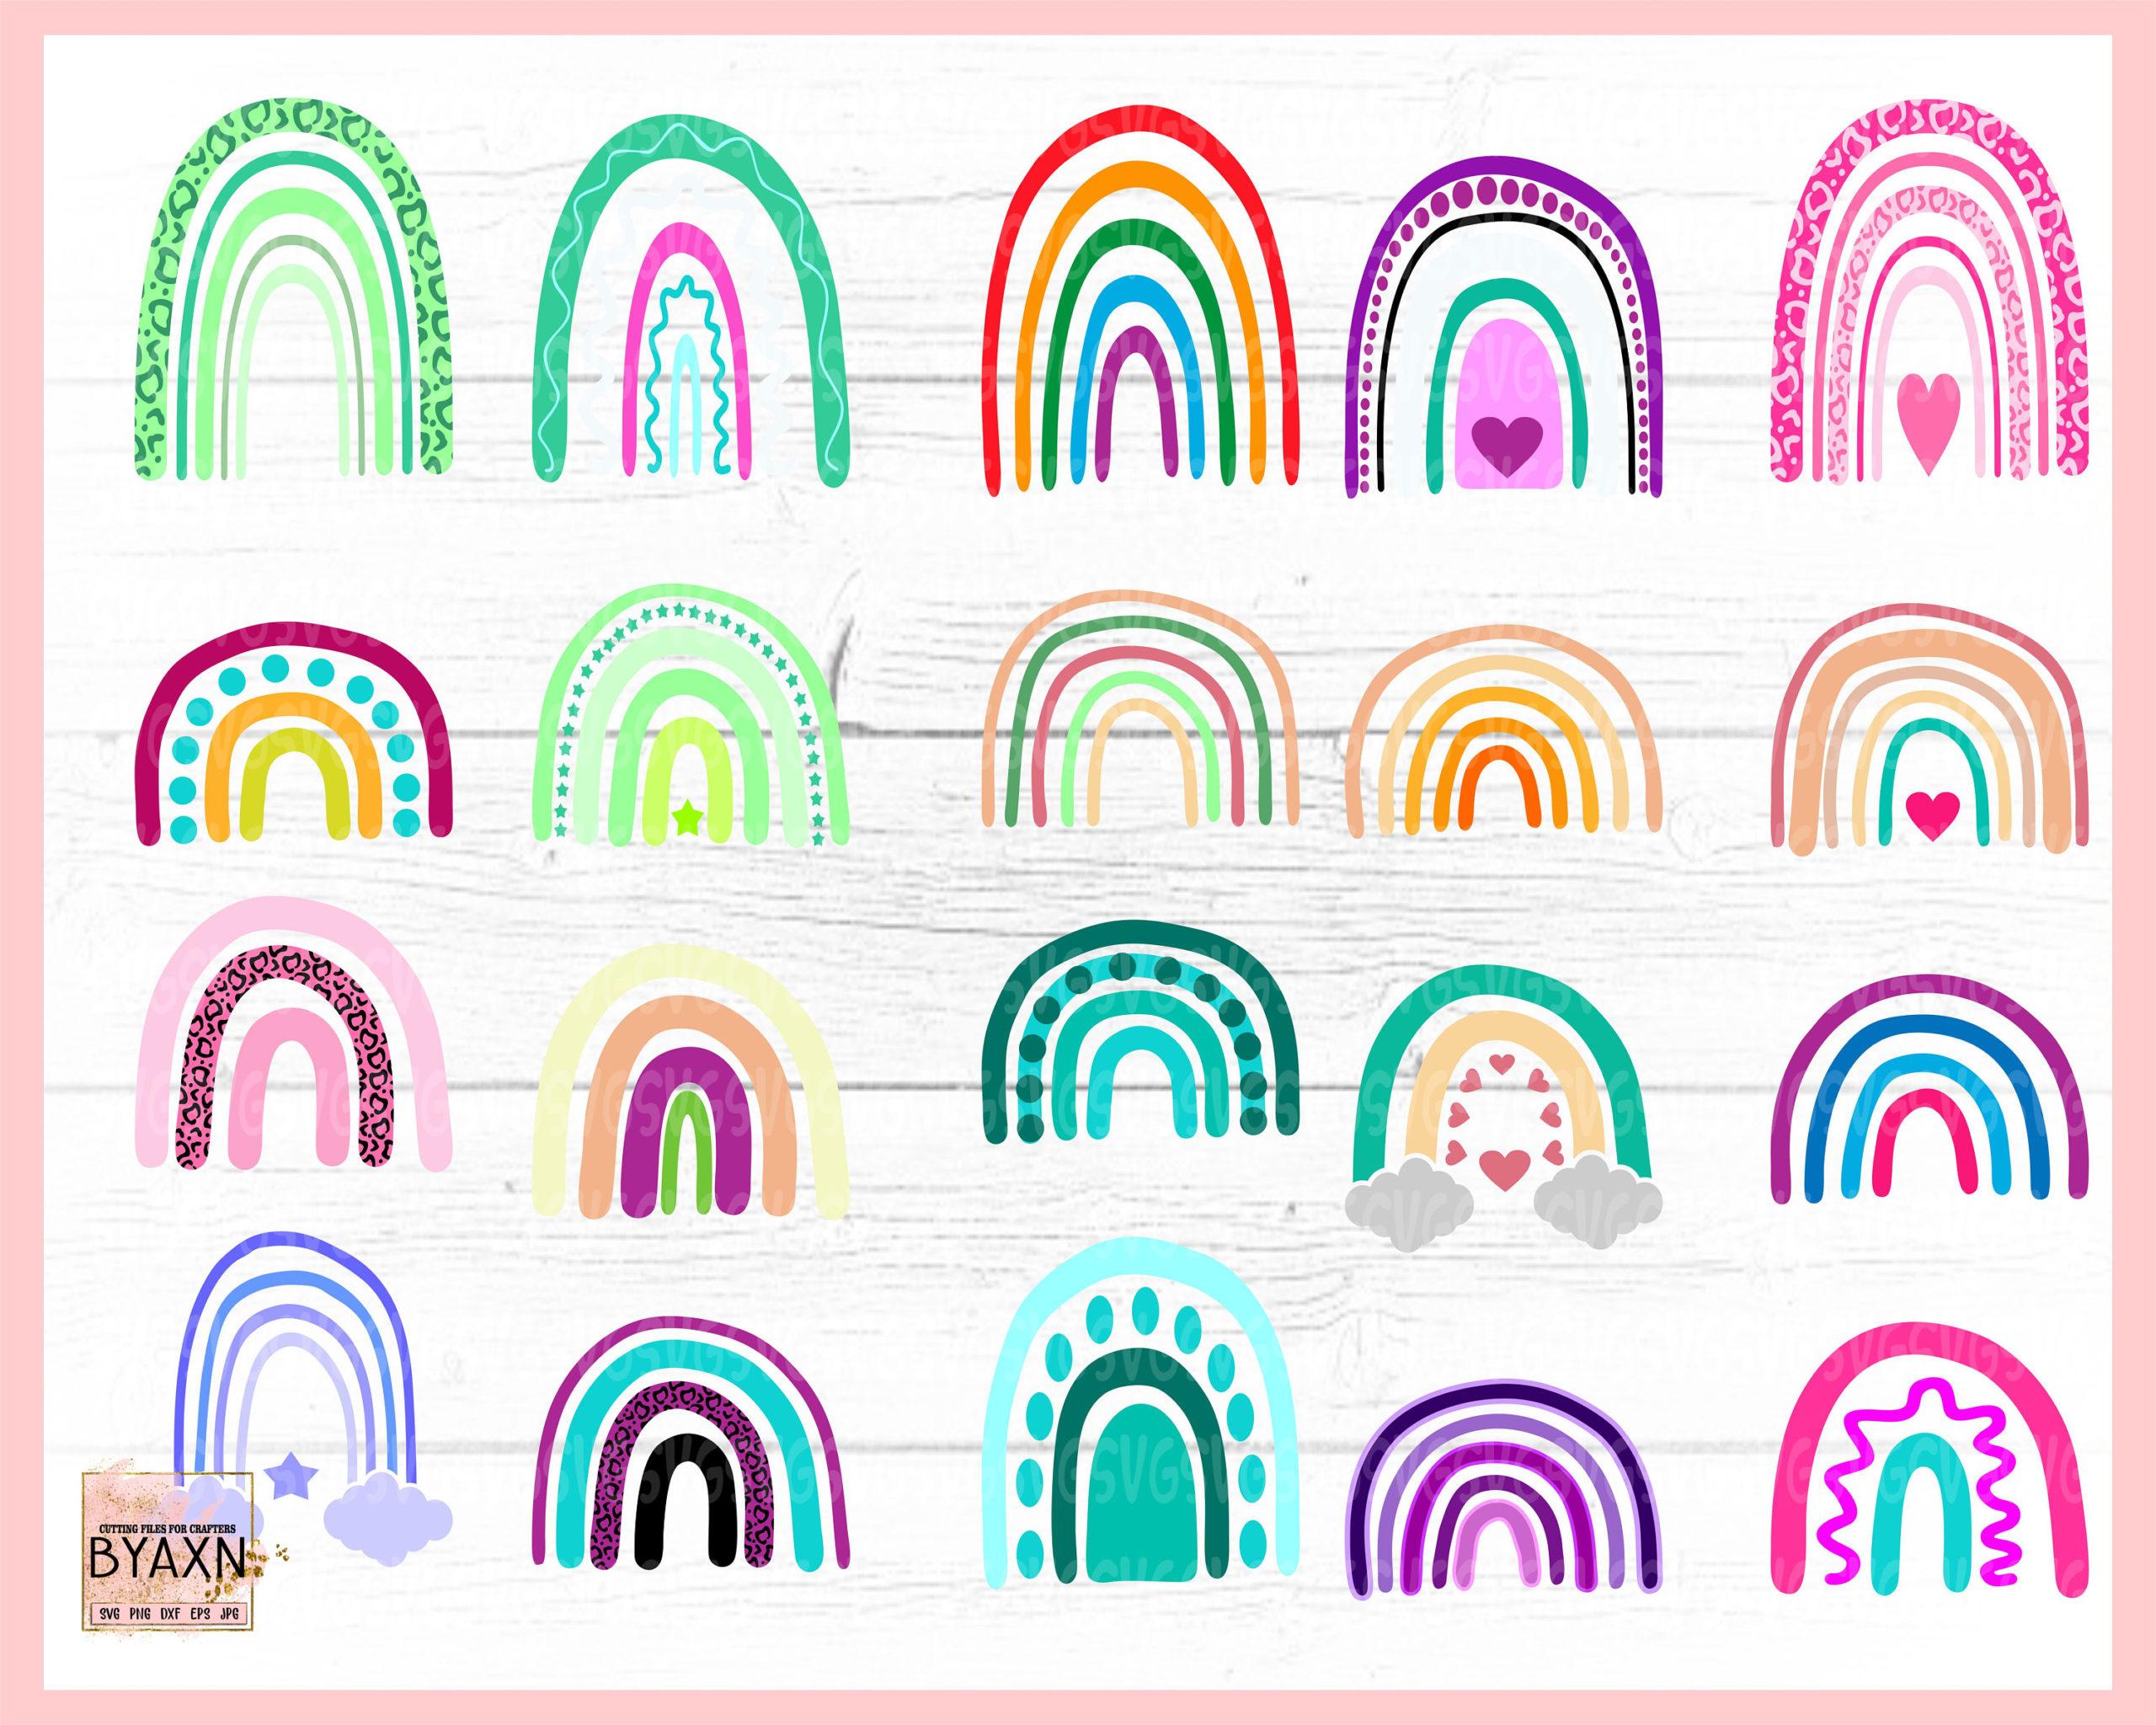 Cricut-boho-rainbow-bundle-rainbow-bundle-boho-rainbow-svg-boho-rainbow-svg-design-rainbow-cut-file-hand-drawn-rainbow-bundle-60514bf1